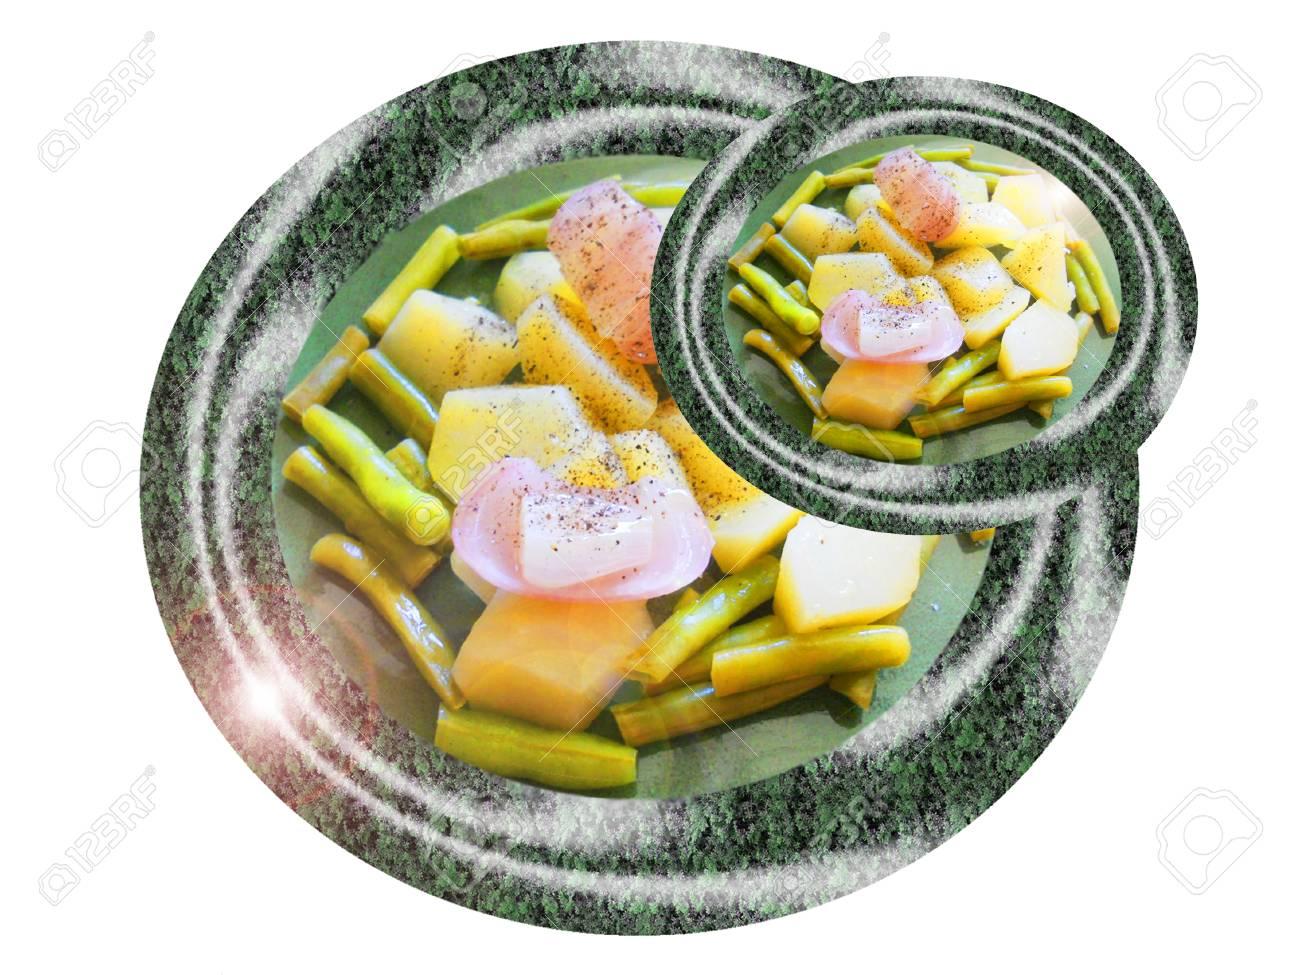 Steamed vegetables. Composition. Foto de archivo - 37570540